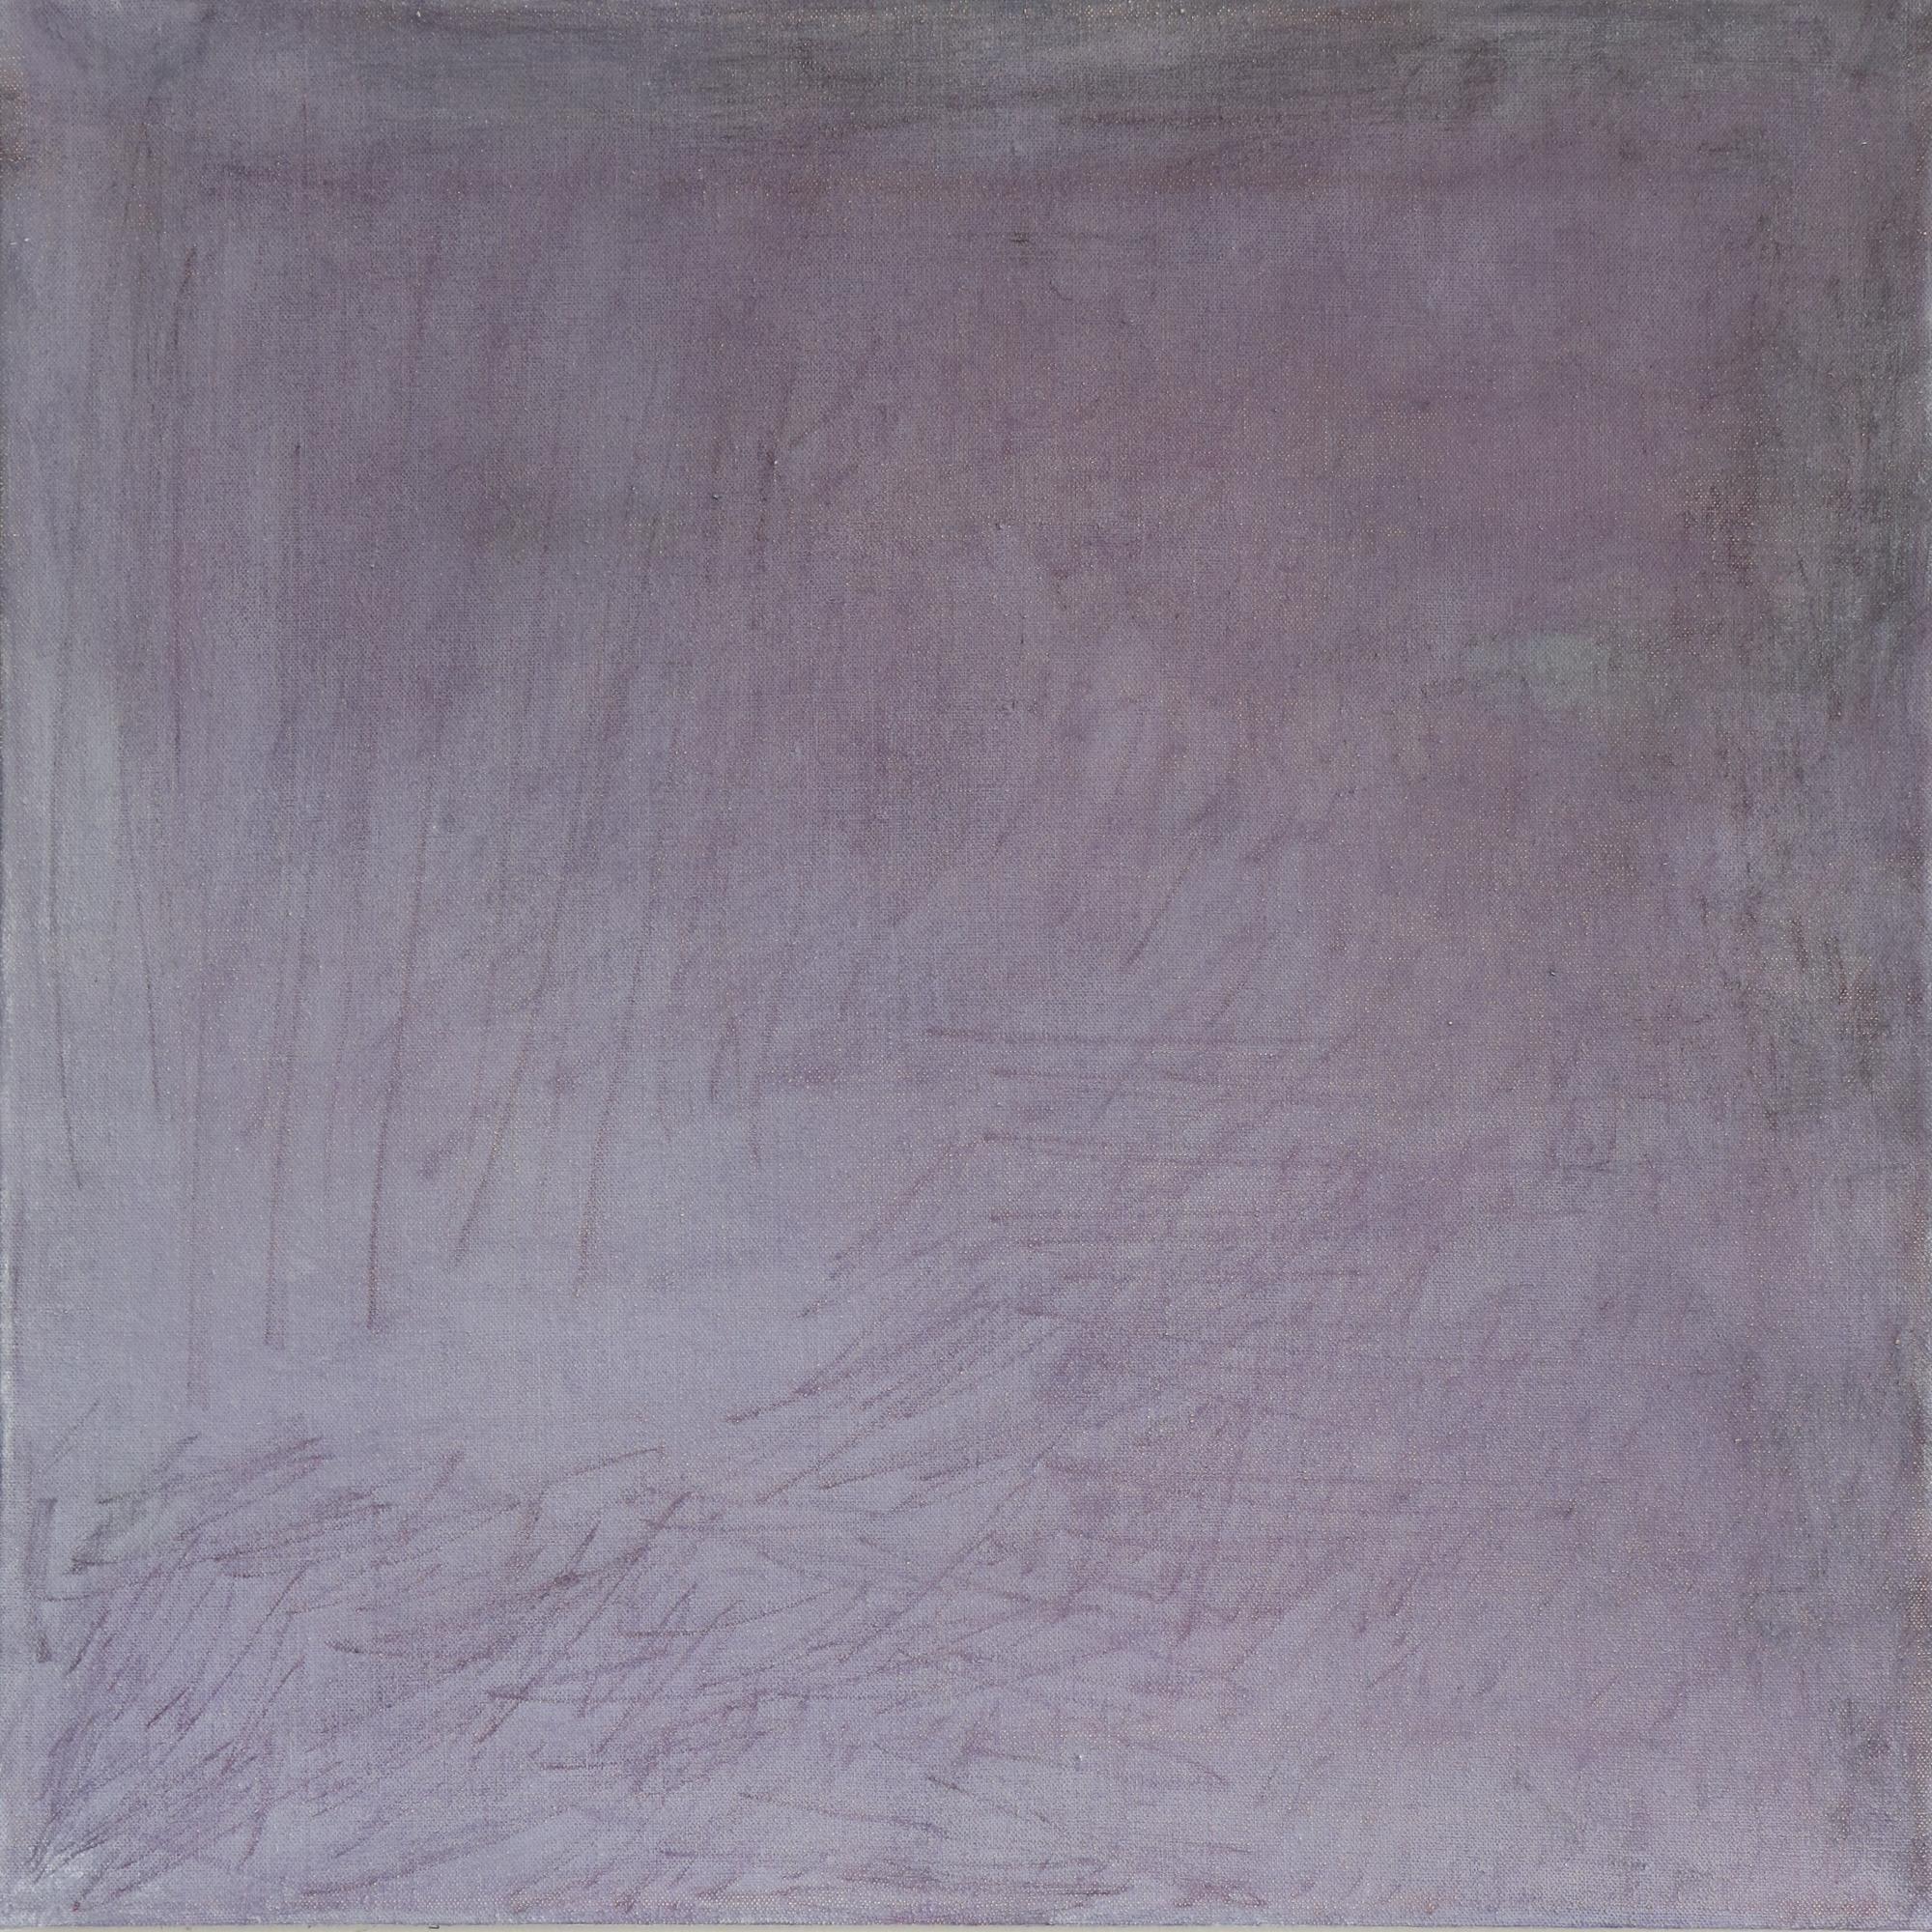 Untitled (19222201)